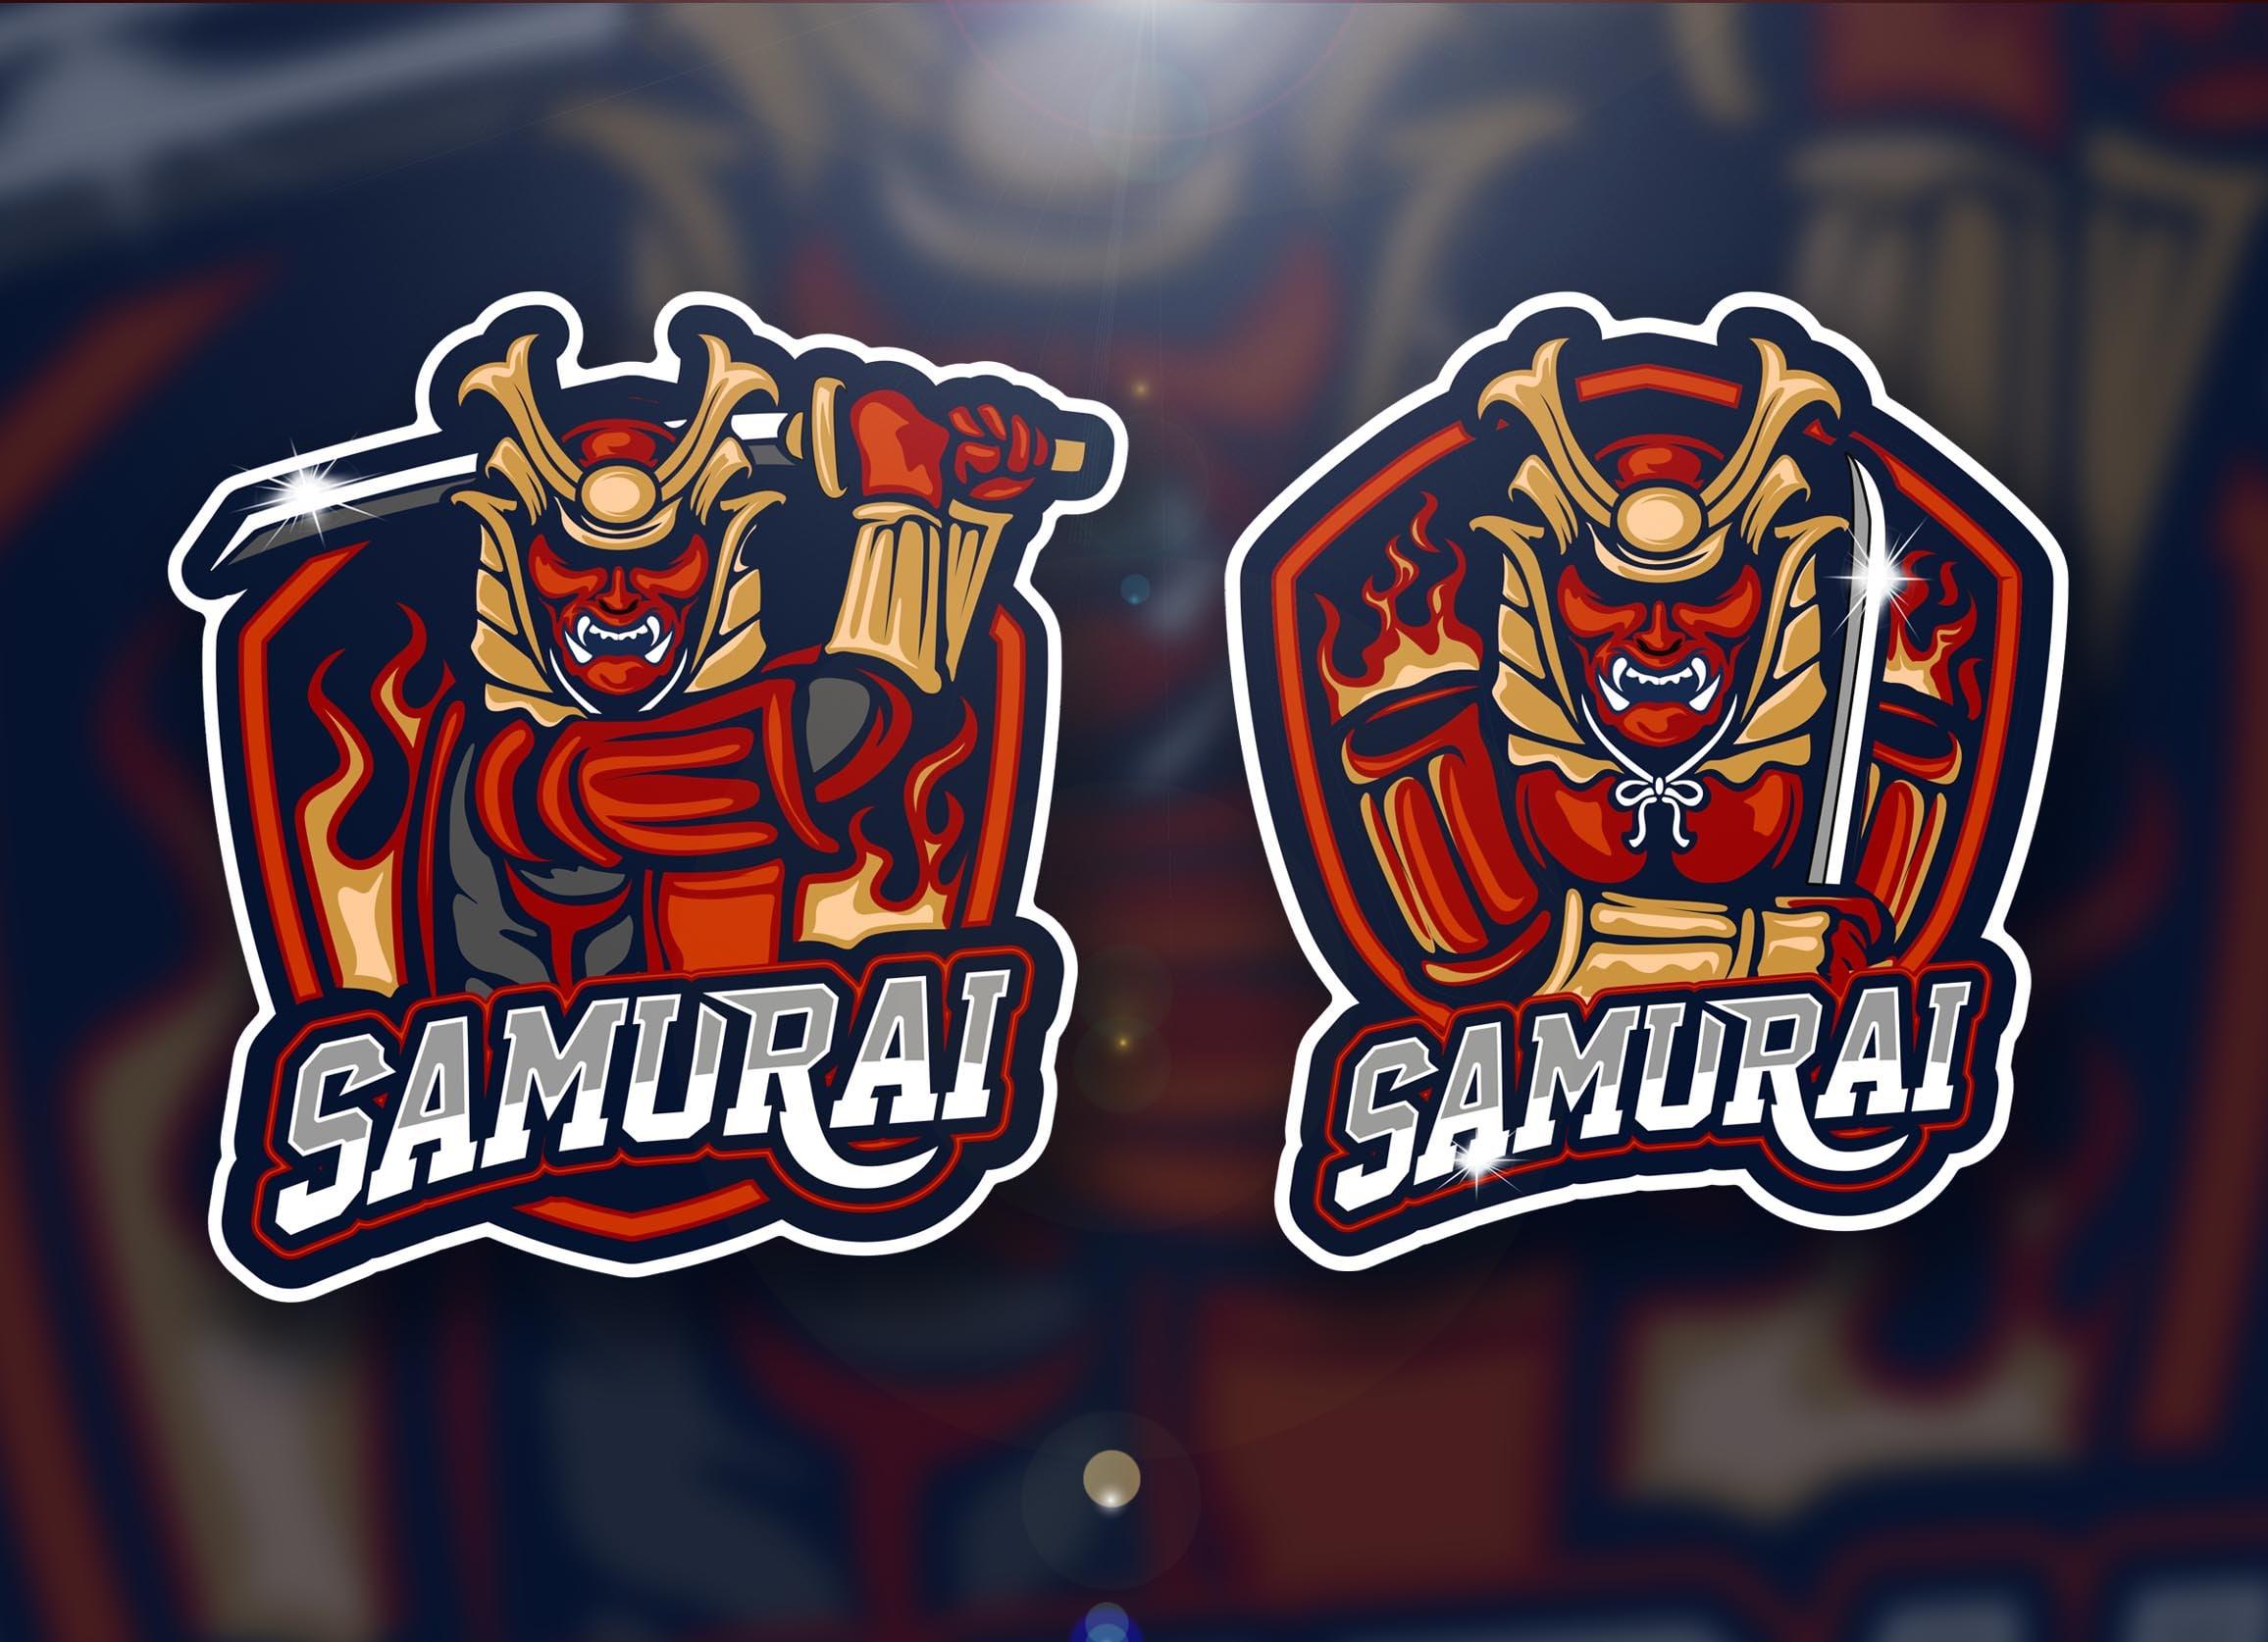 Samurai Mascot Creative Cool Logo Sports Www Galleryneed Com